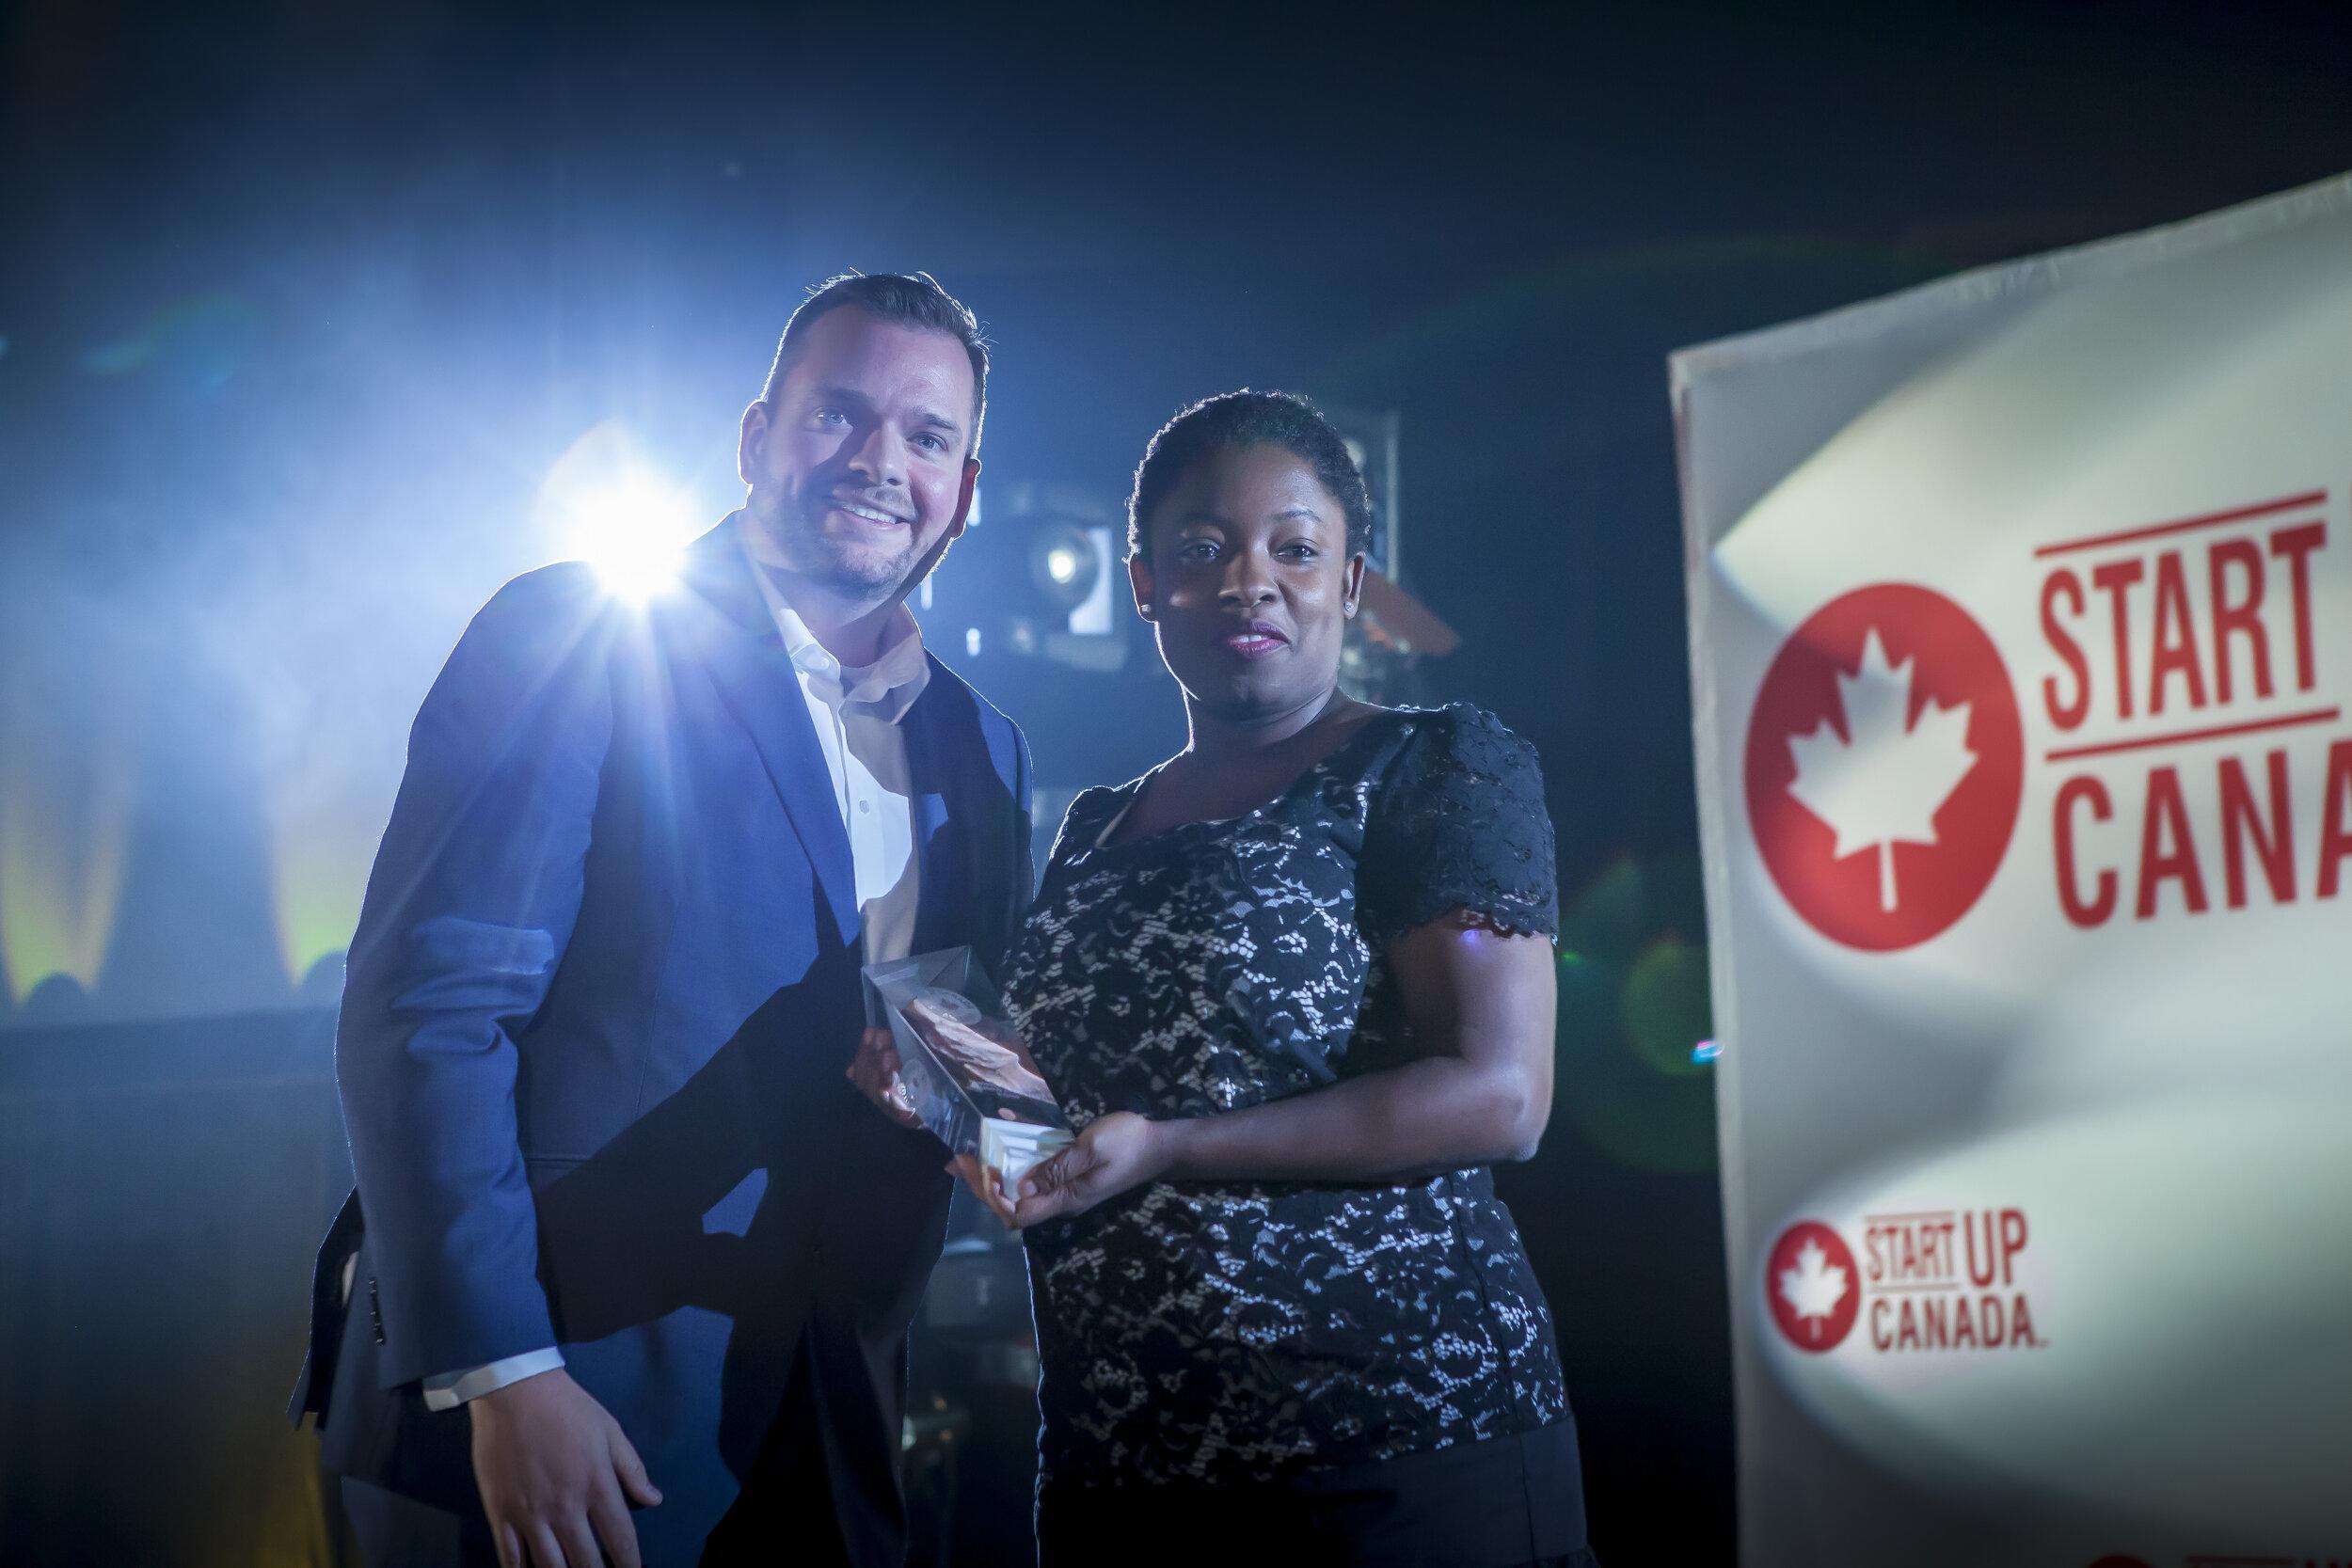 StartuCanada Award IBEF national.jpg